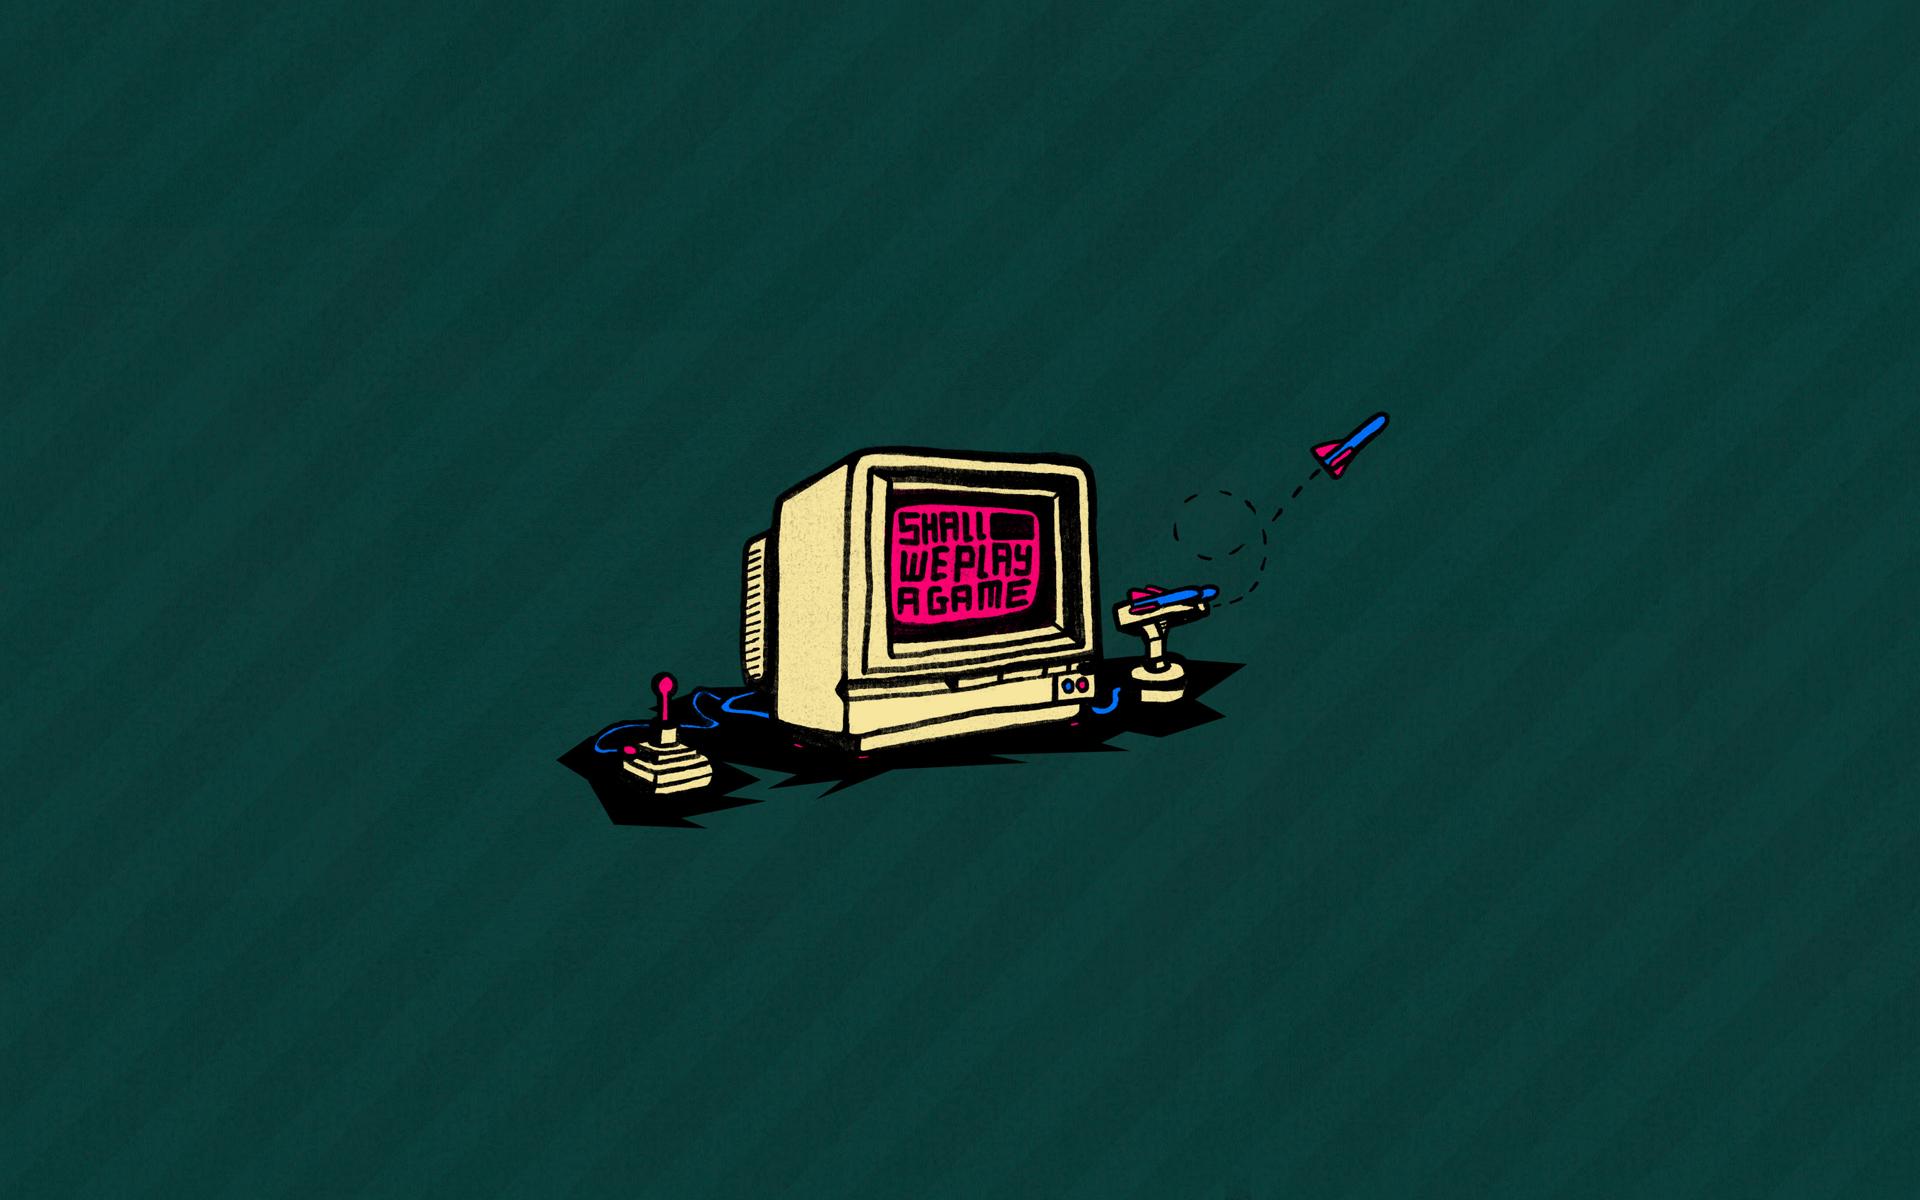 Retro Computer Gaming Wallpaper 64256 1920x1200px 1920x1200